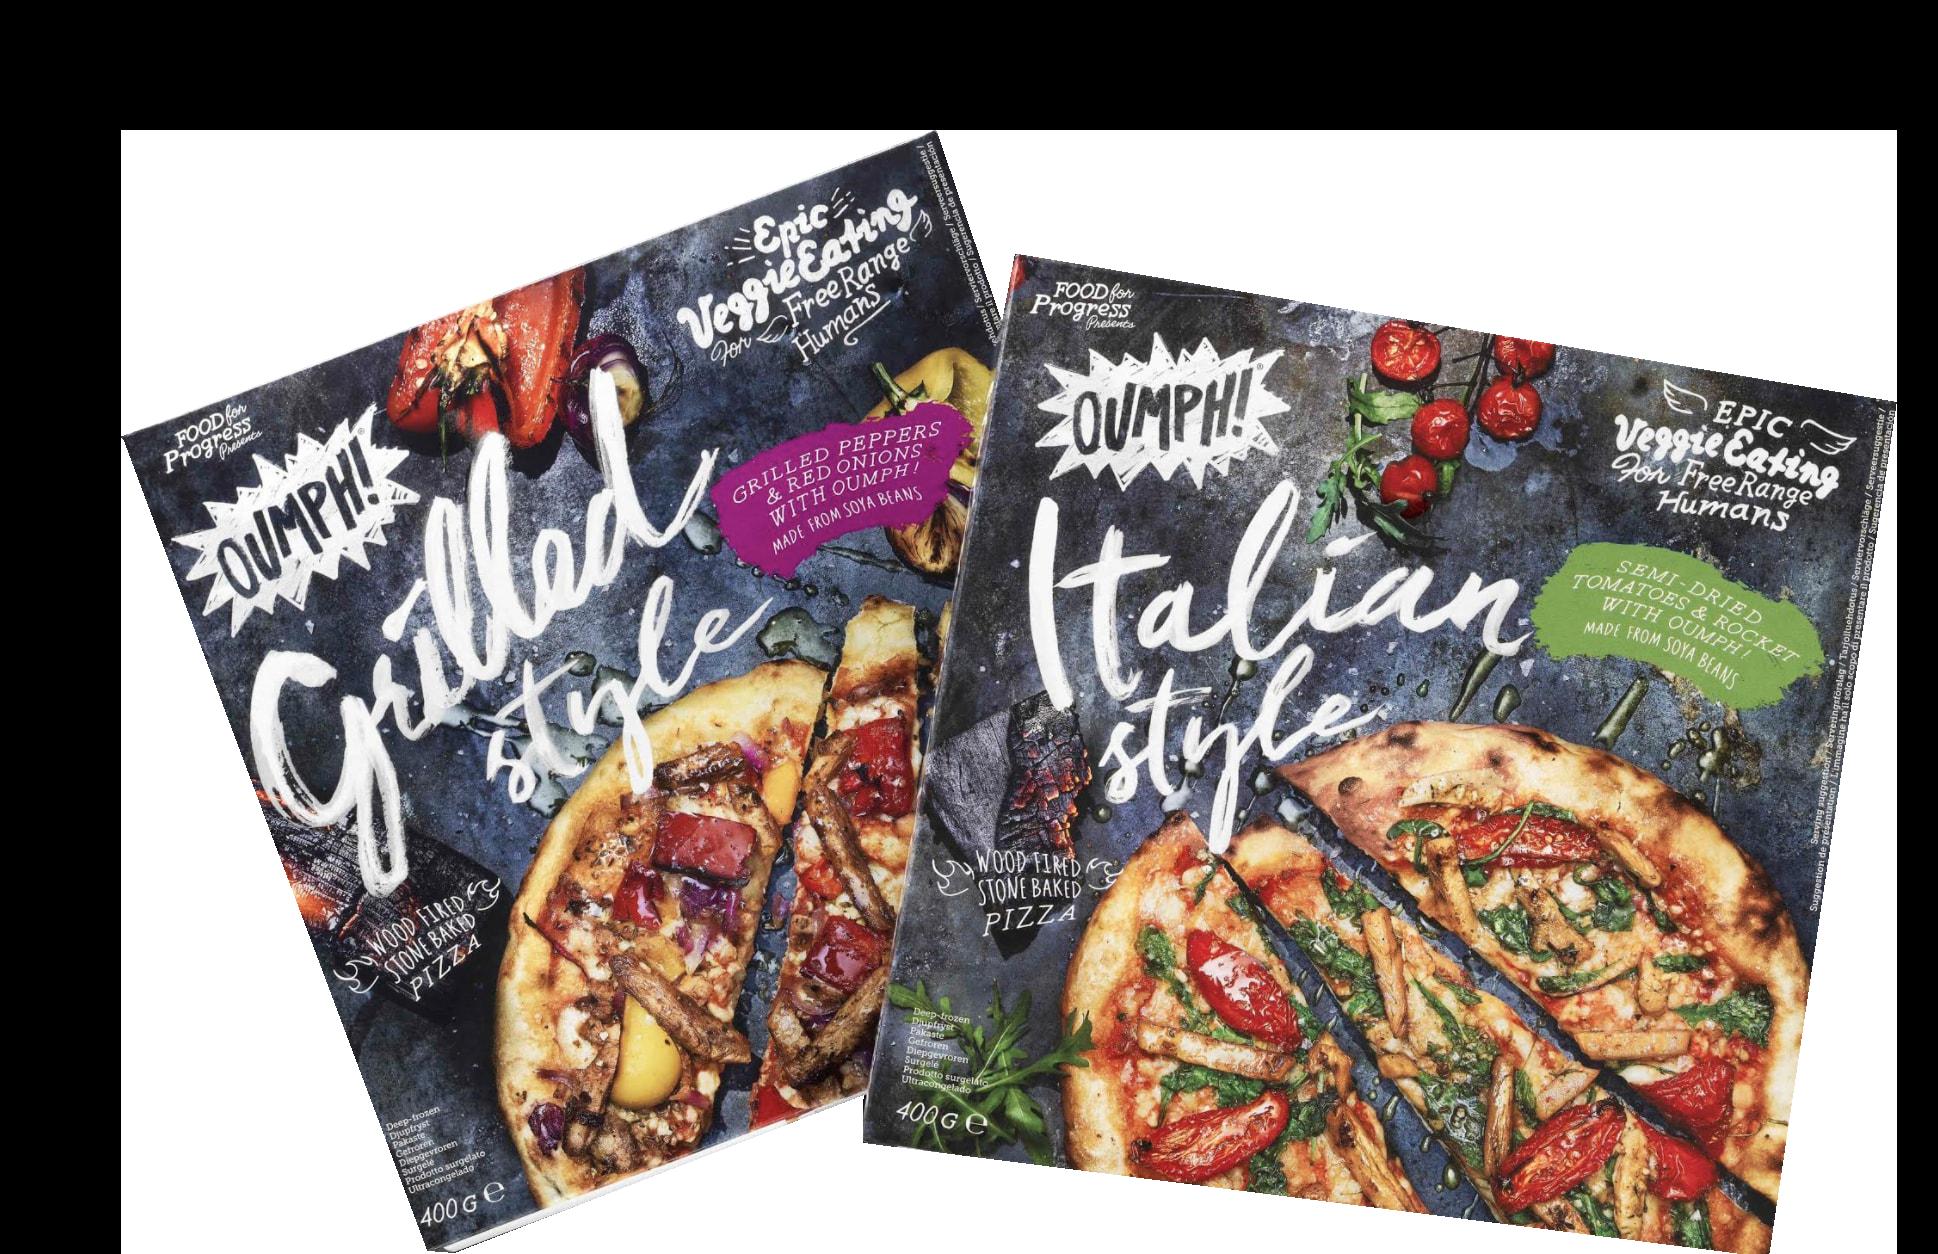 oumph 2 pizzas-1.png